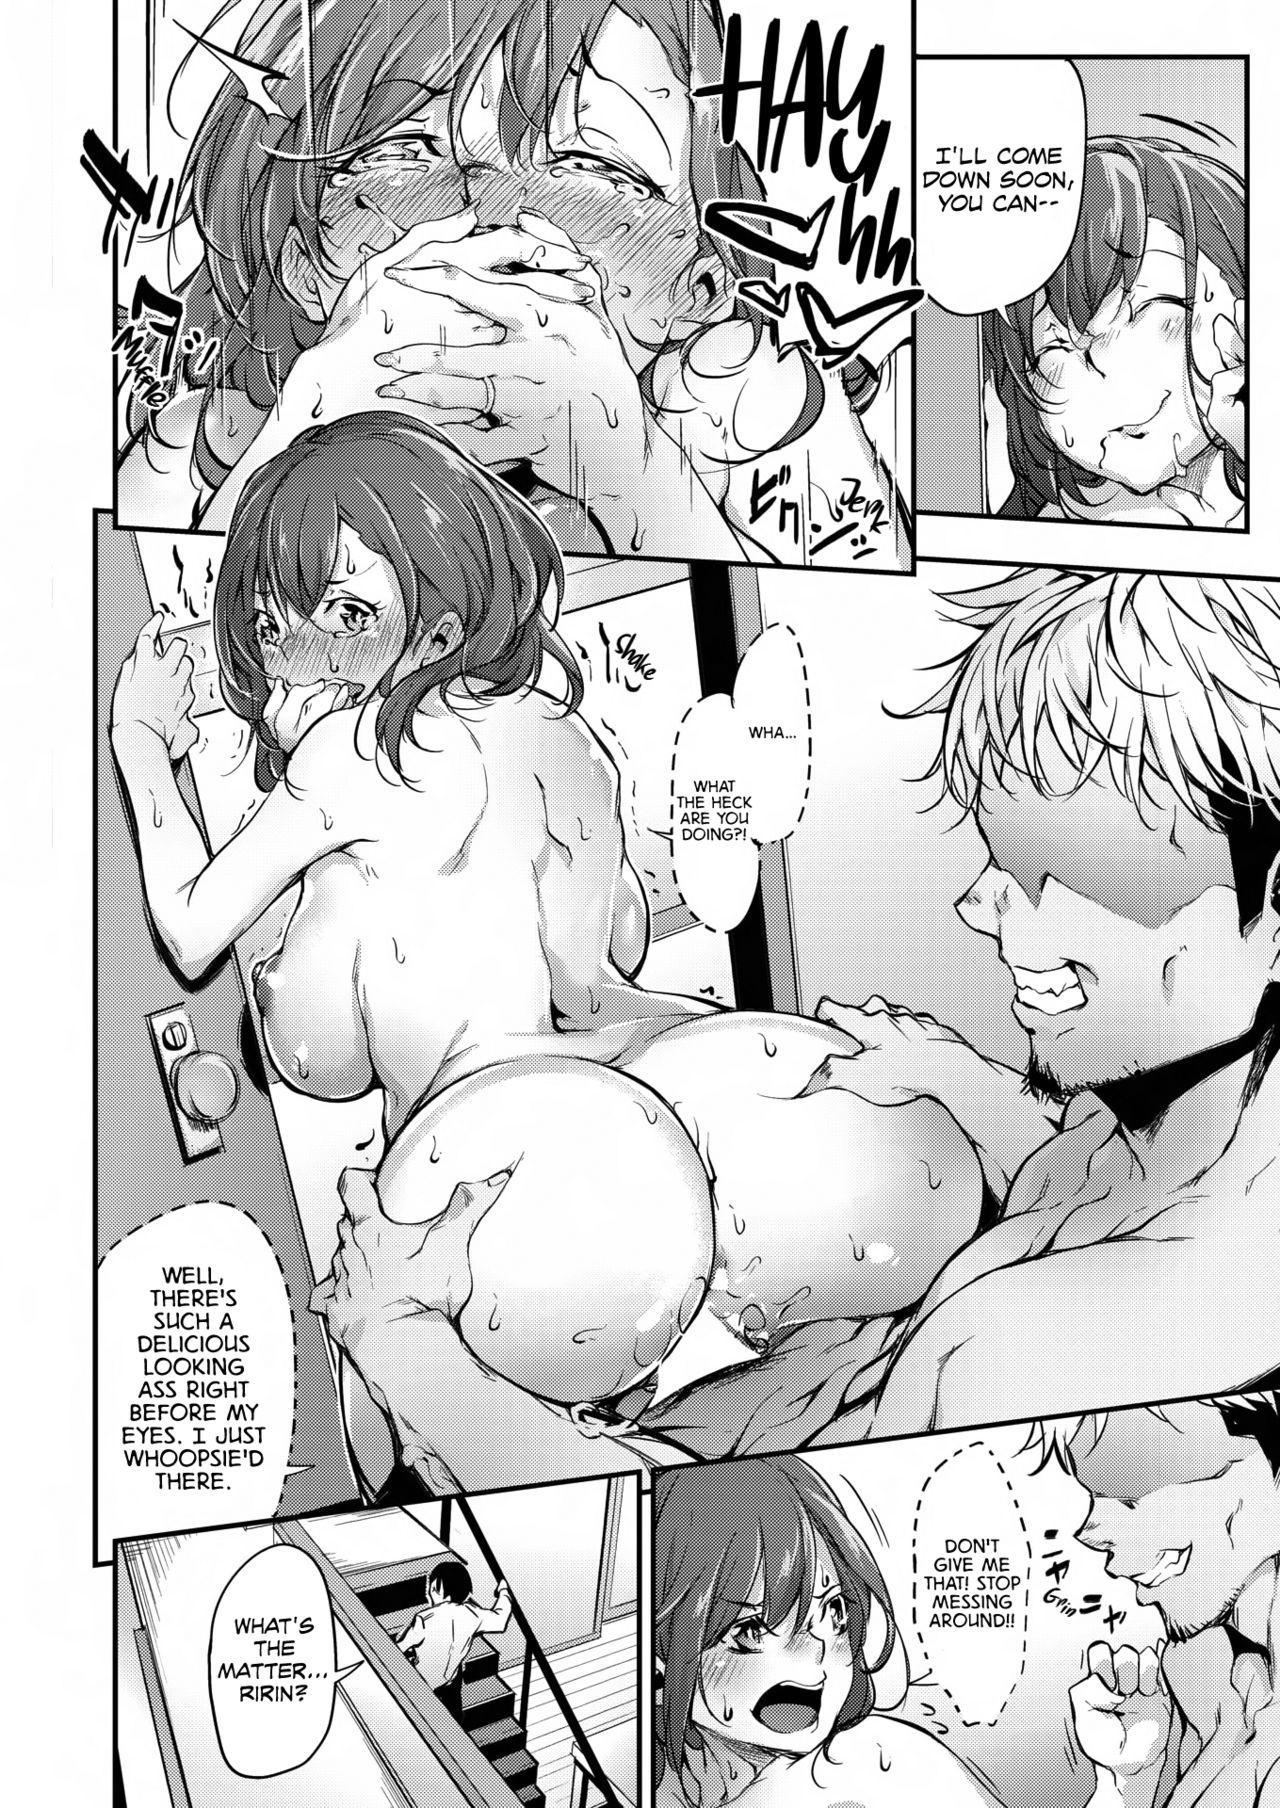 [Rokuichi] Ririn-san no Naisho no Kao to Daiji na Oheya   Secret Side of Ririn-san and Her Precious Room (COMIC HOTMILK 2018-07) [English] [Stupid Beast] [Digital] 13